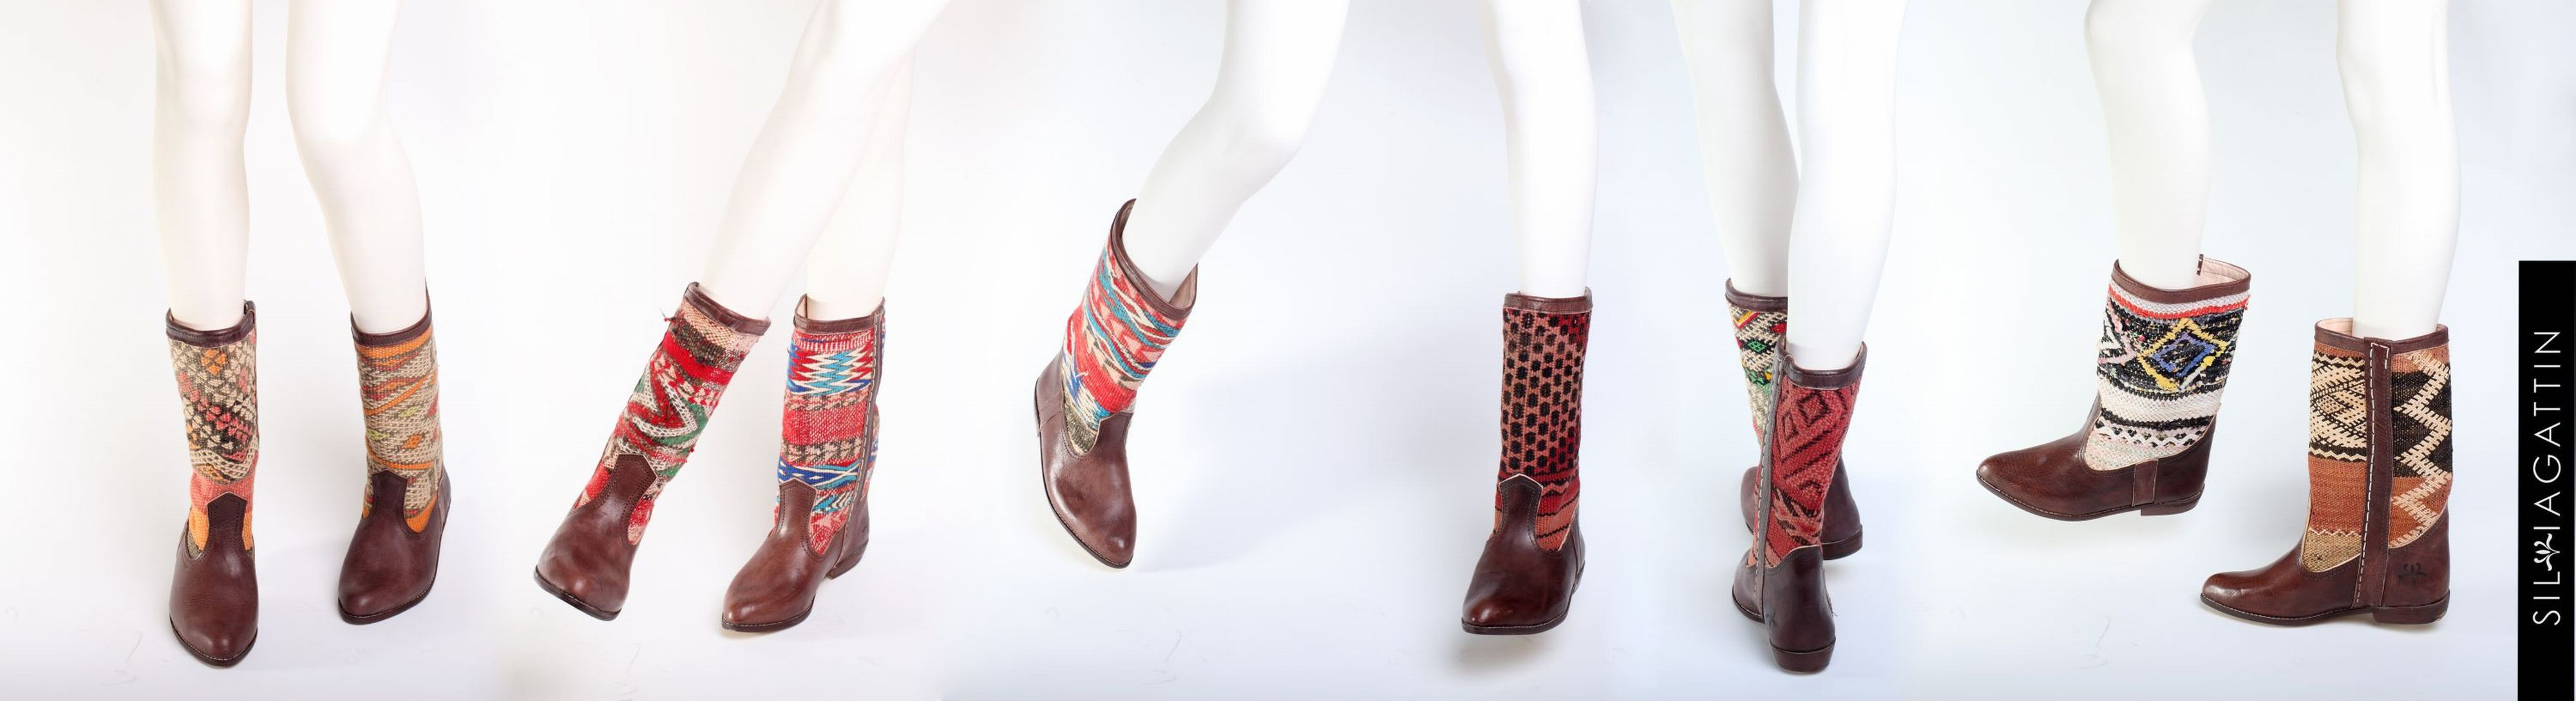 Abdillah_Boots_Silvia_Gattin